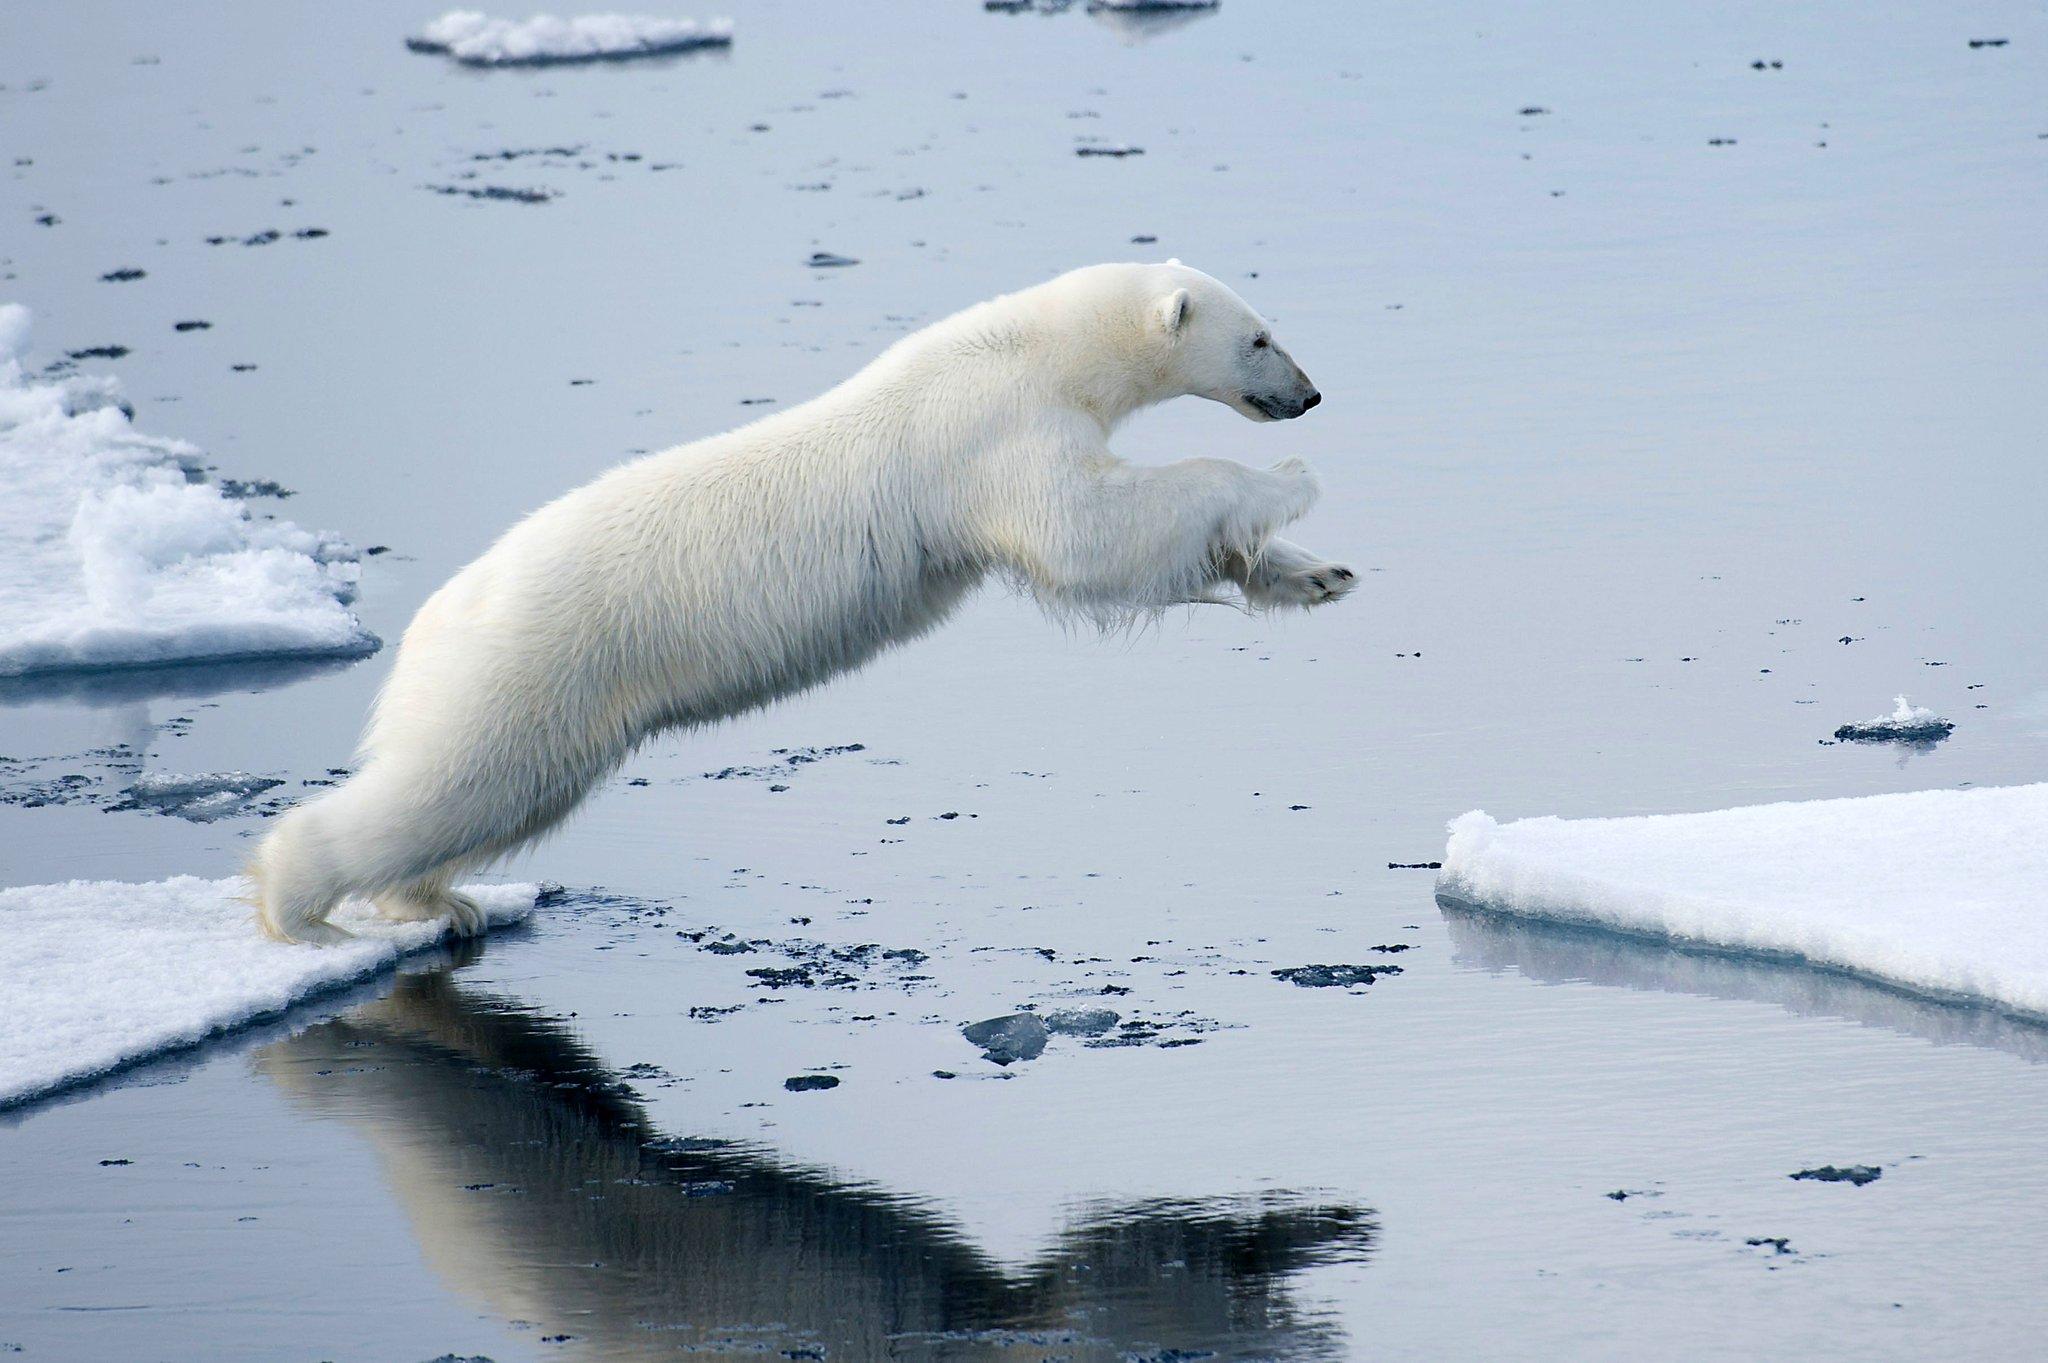 The increasingly melting ice around the Arctic is causing concern for polar bear breeding. (Ariadne Van Zandbergen) https://t.co/ylGVsu8Lfg